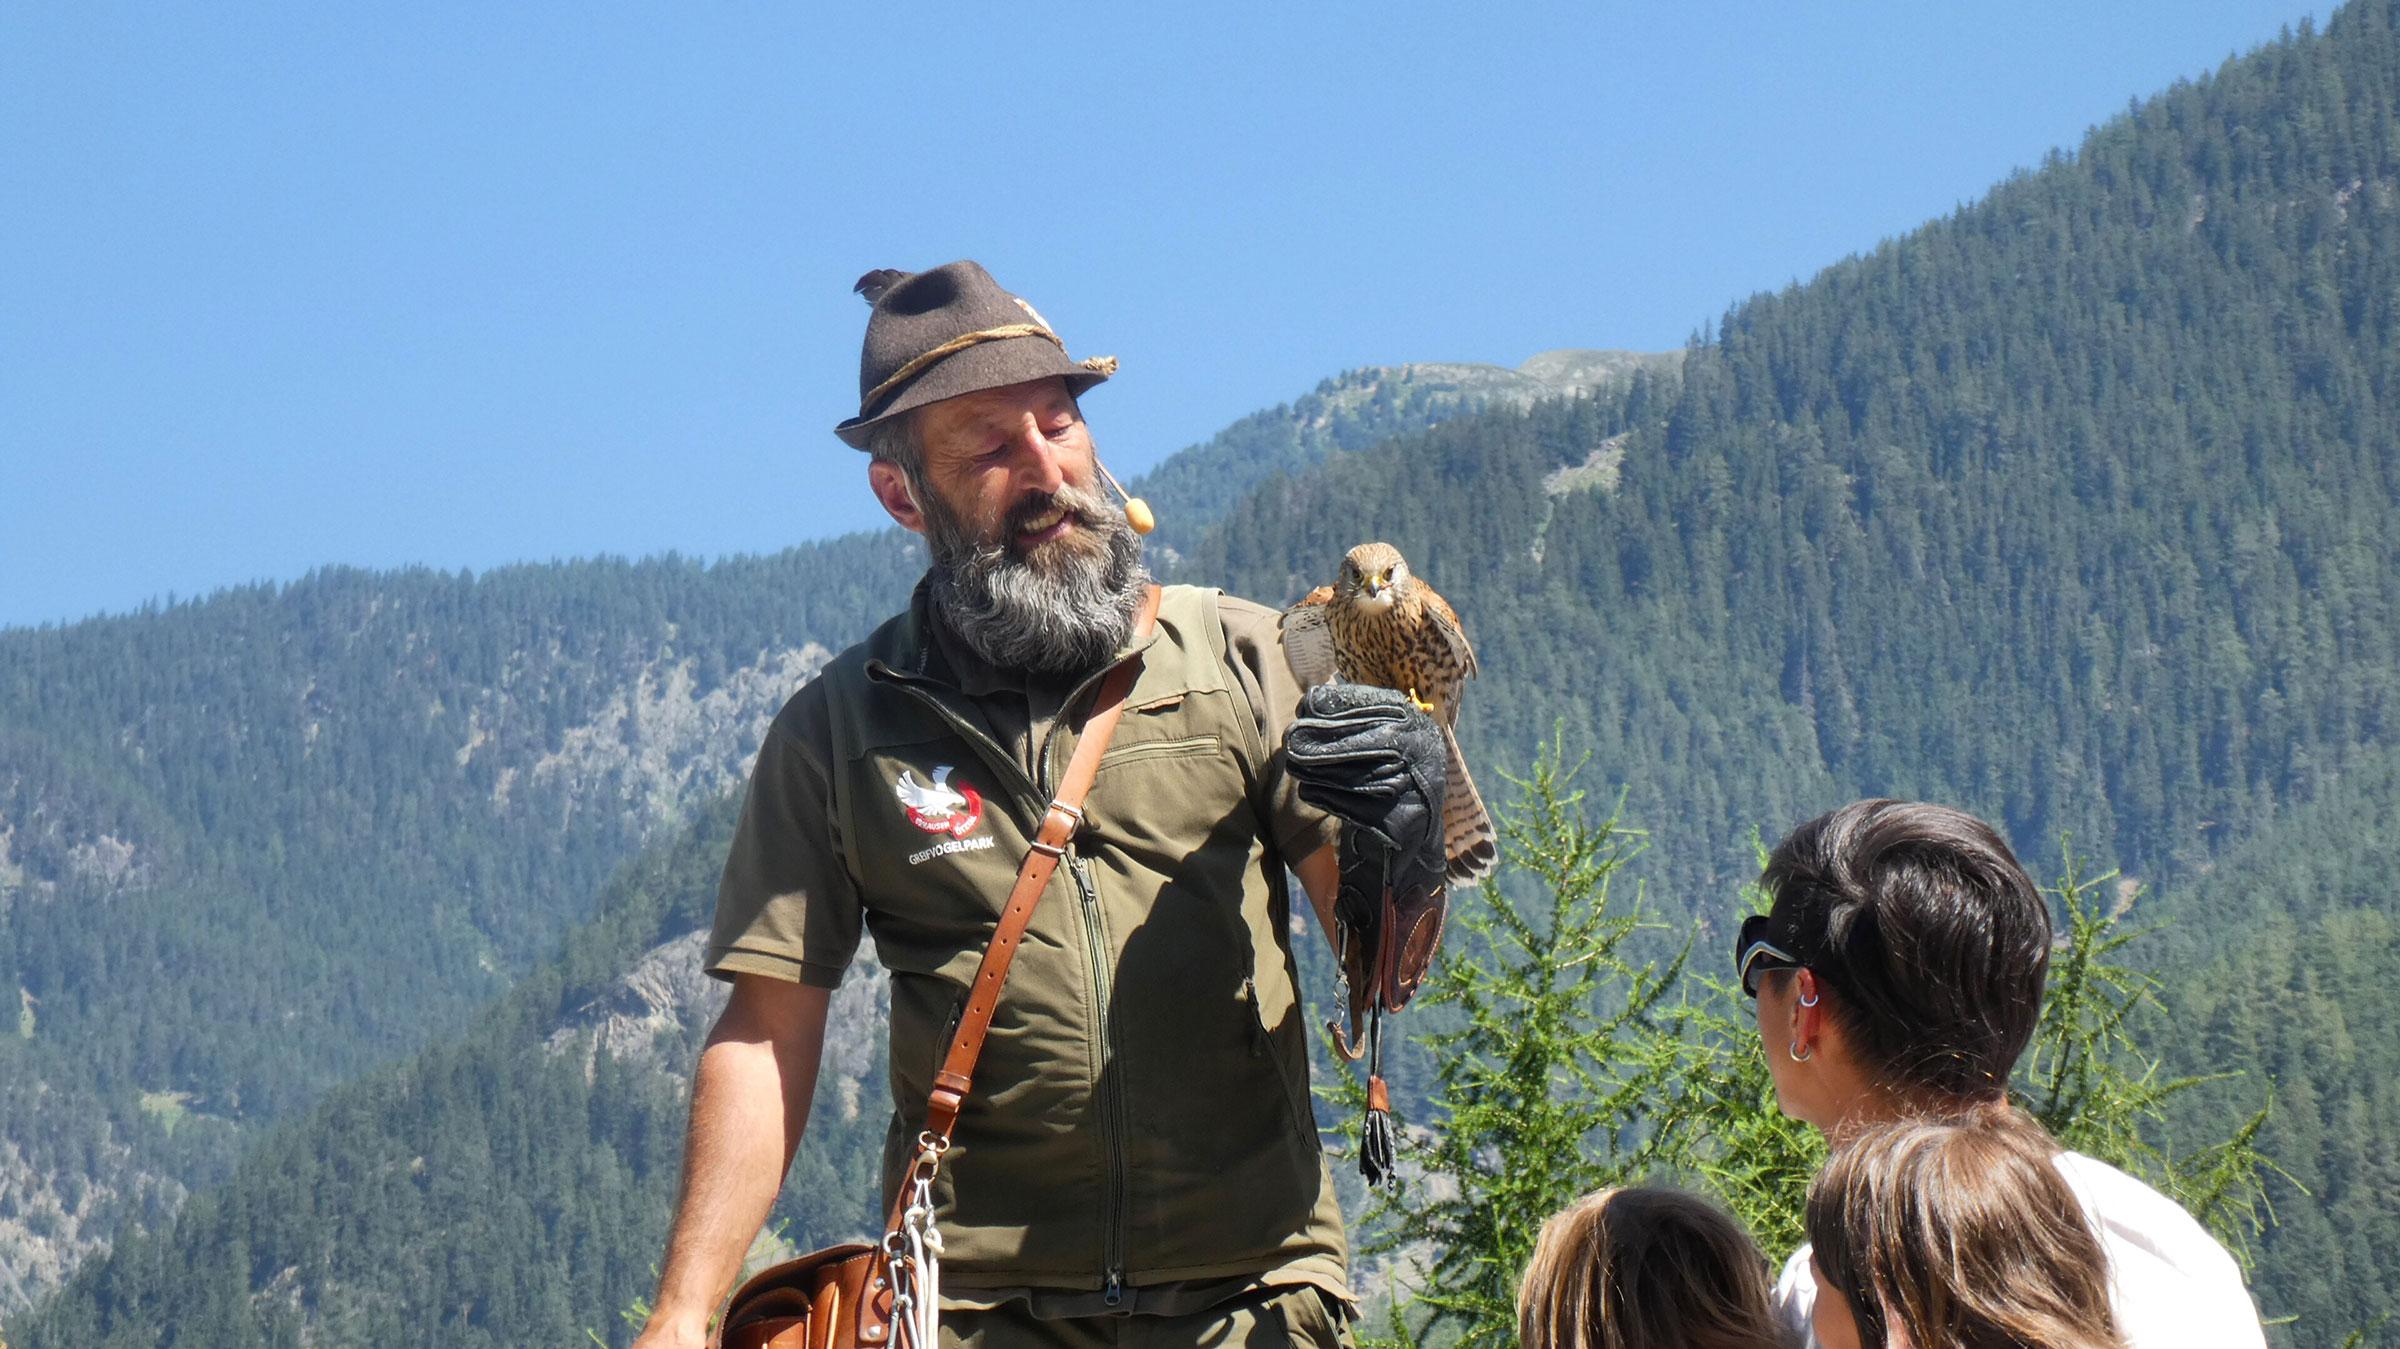 Greifvogelpark - Familienurlaub Ötztal Tirol